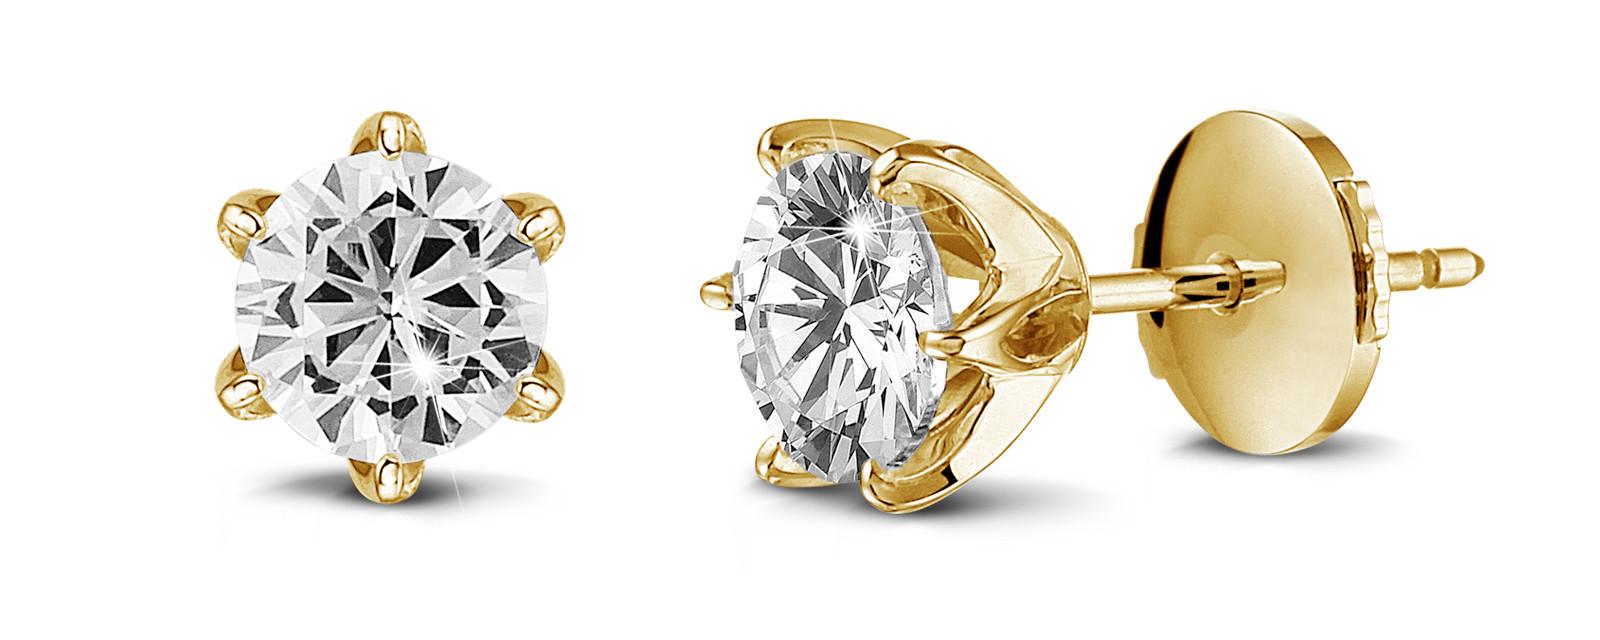 How many carats should I choose for diamond stud earrings or earrings?